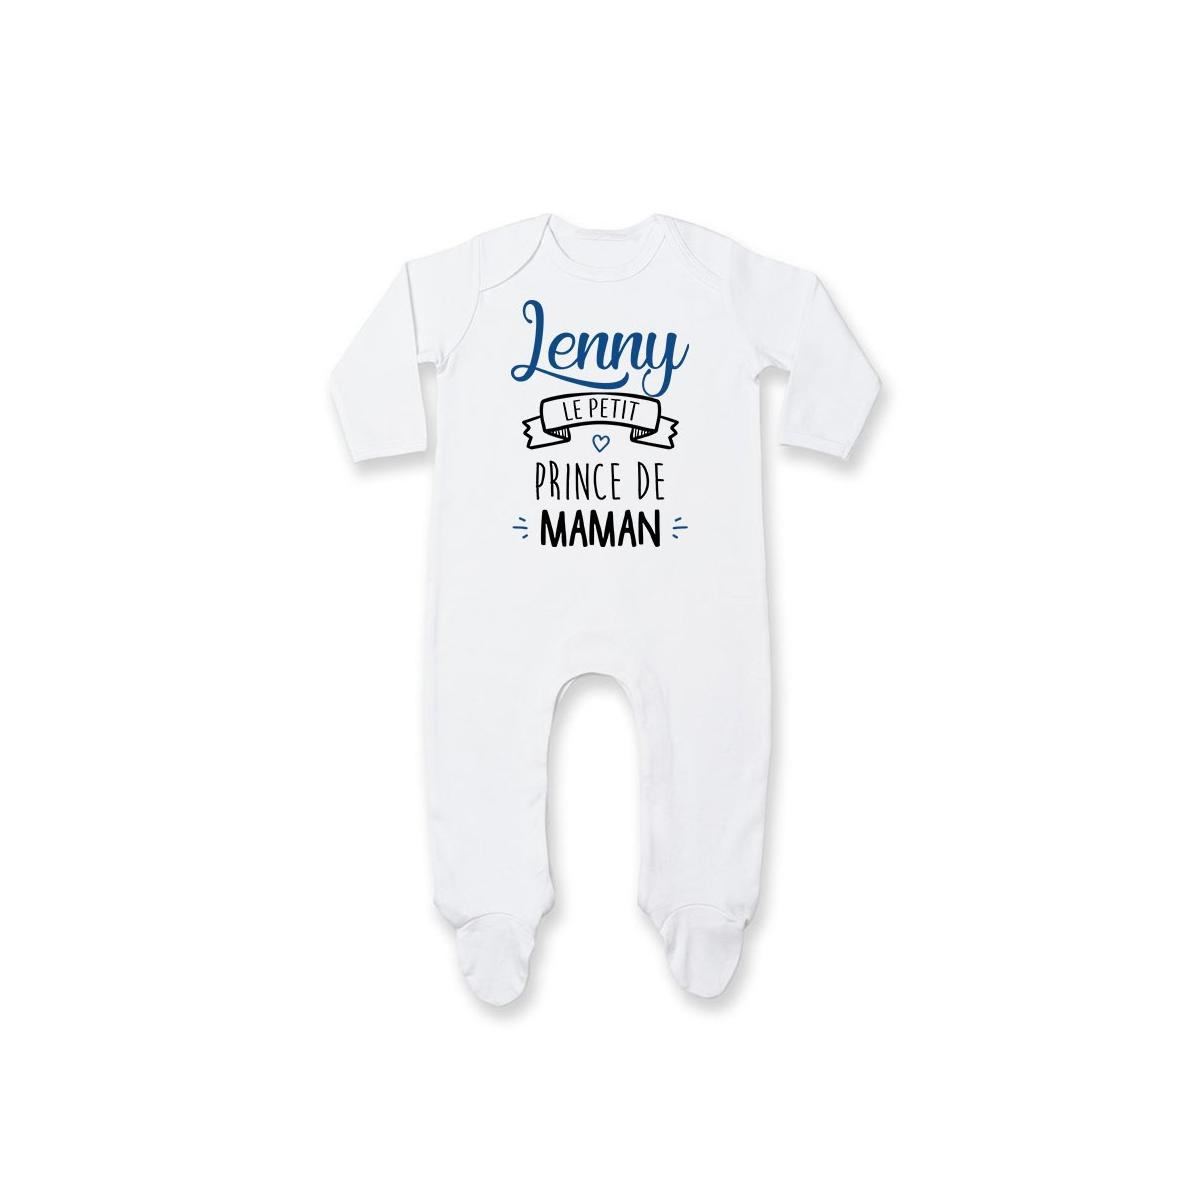 "Pyjama bébé personnalisé "" prénom "" le petit prince de maman"